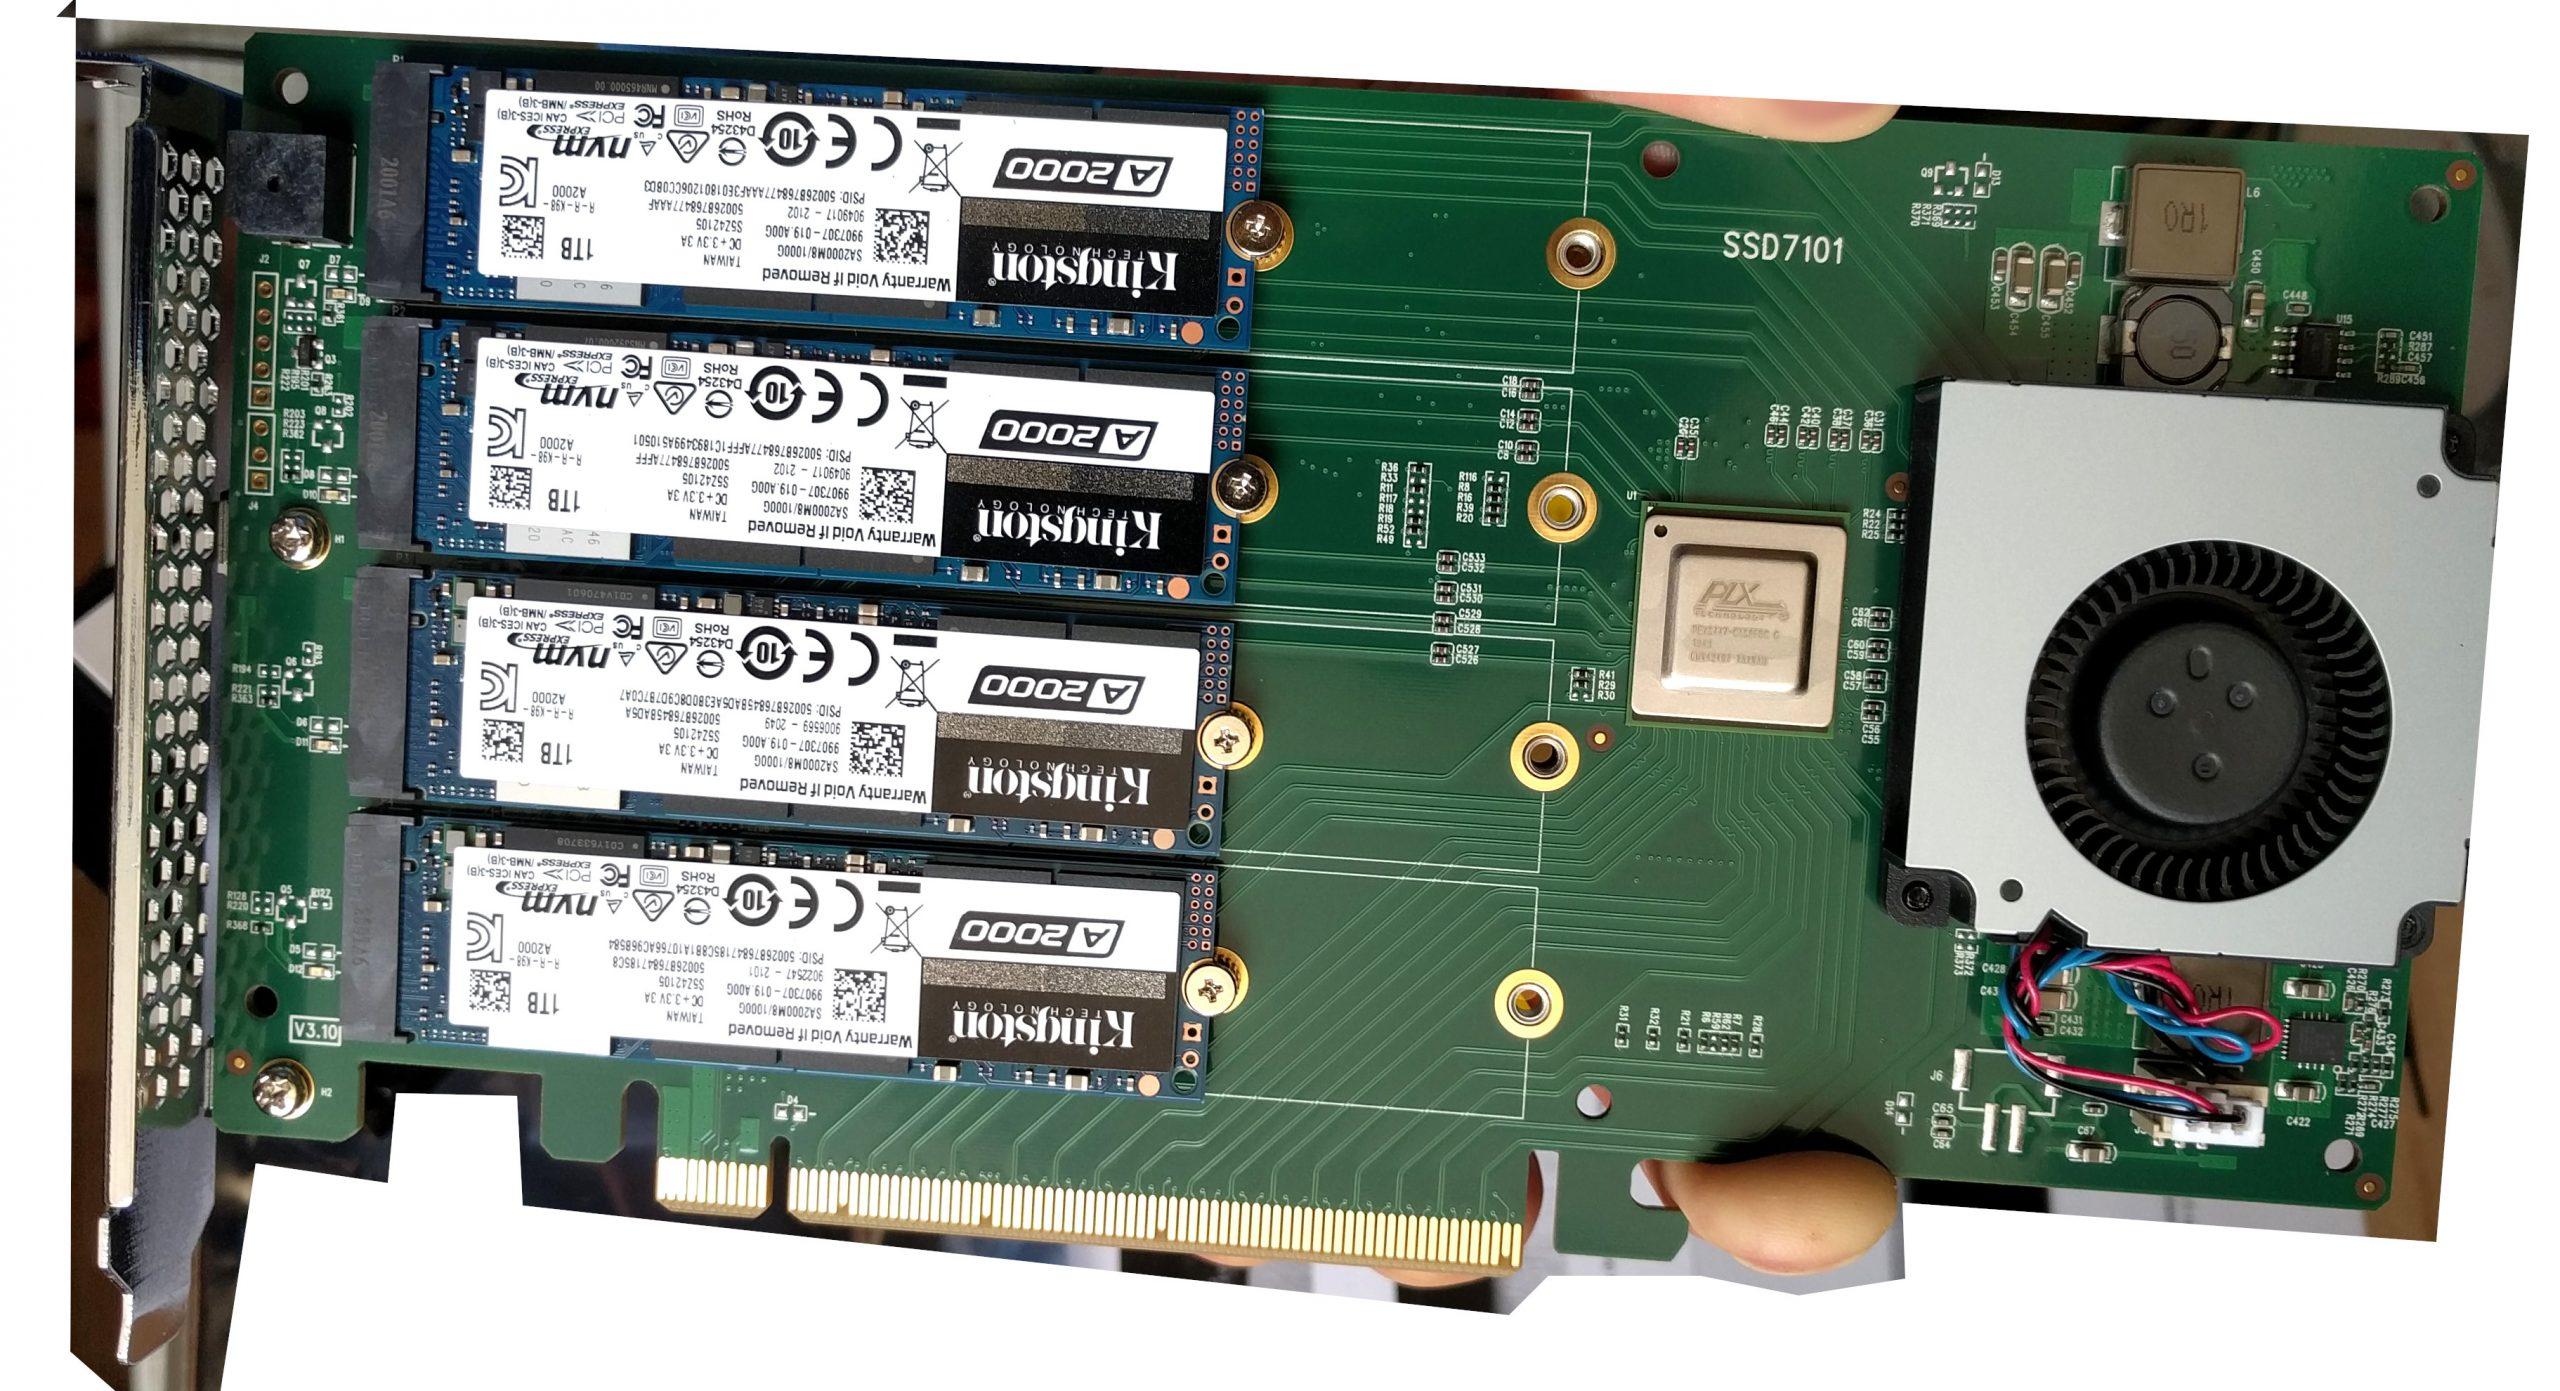 GNU Linux & Windows Server 2012 R2 – benchmark results HighPoint SSD7101A-1 NVMe RAID (harddisk) card + 4x 1TB Kingston NVMe (KINGSTON SA2000M81000G)  (individually and in mdadm RAID10 mode) – disk failures under Win 2012 R2